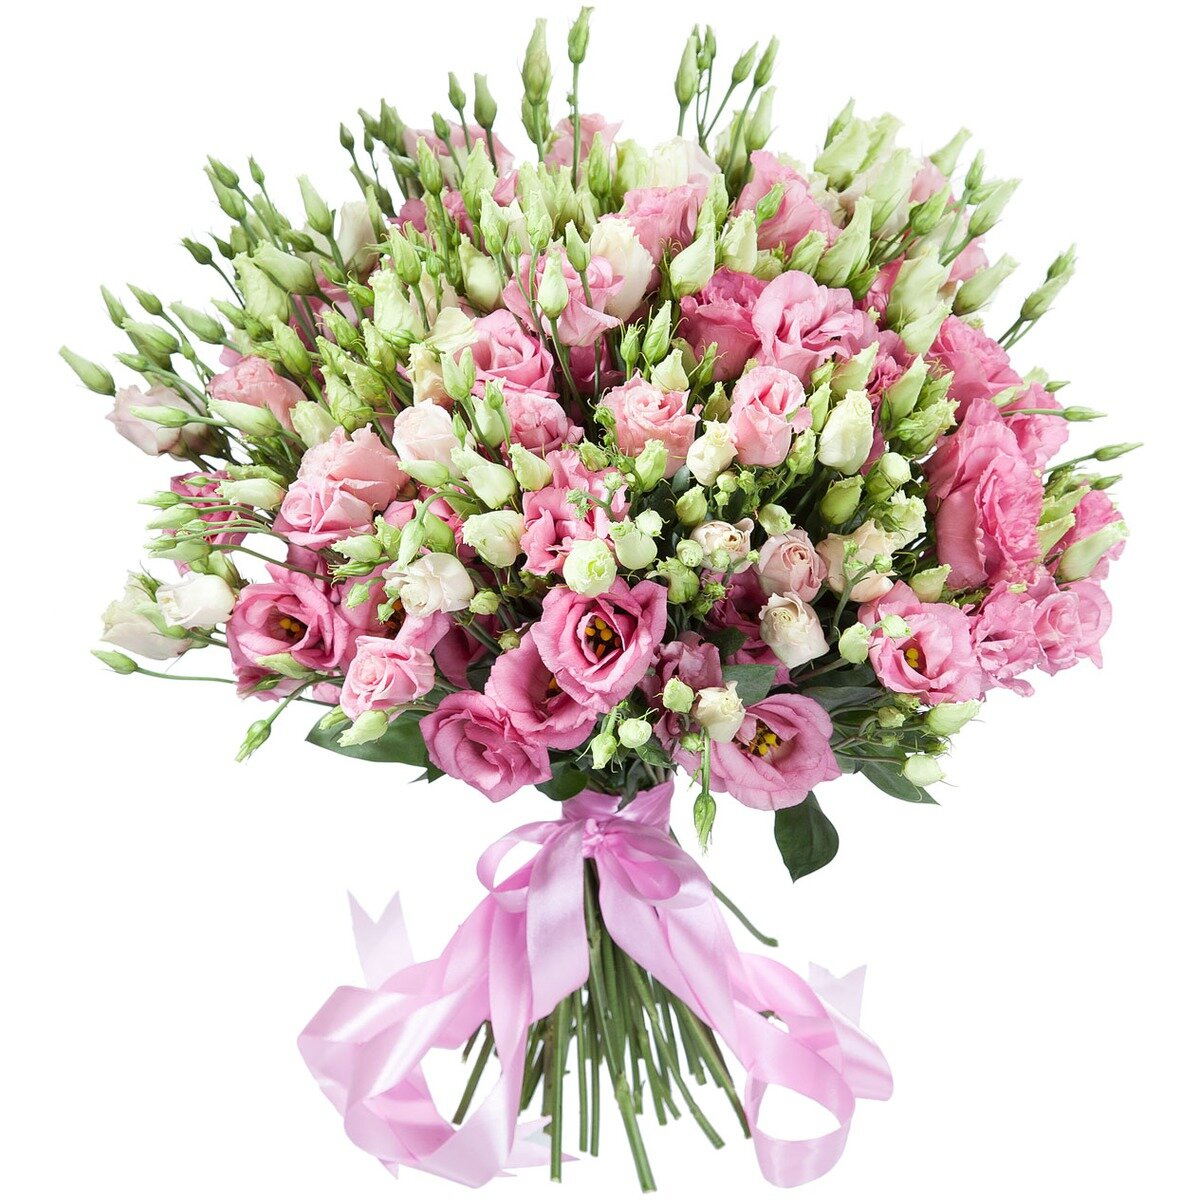 Украина львов заказ цветов, цифры роз фото